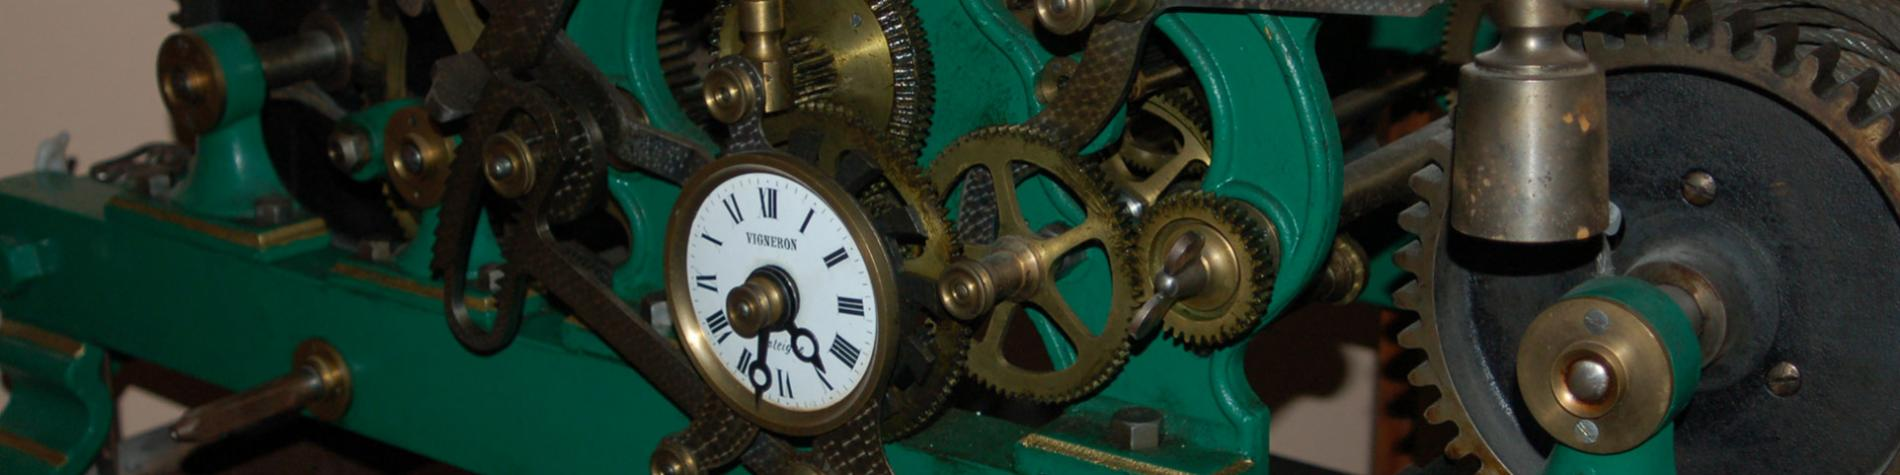 Ancienne fonderie - cloches - Tellin - patrimoine campanaire - cire perdue - horloge